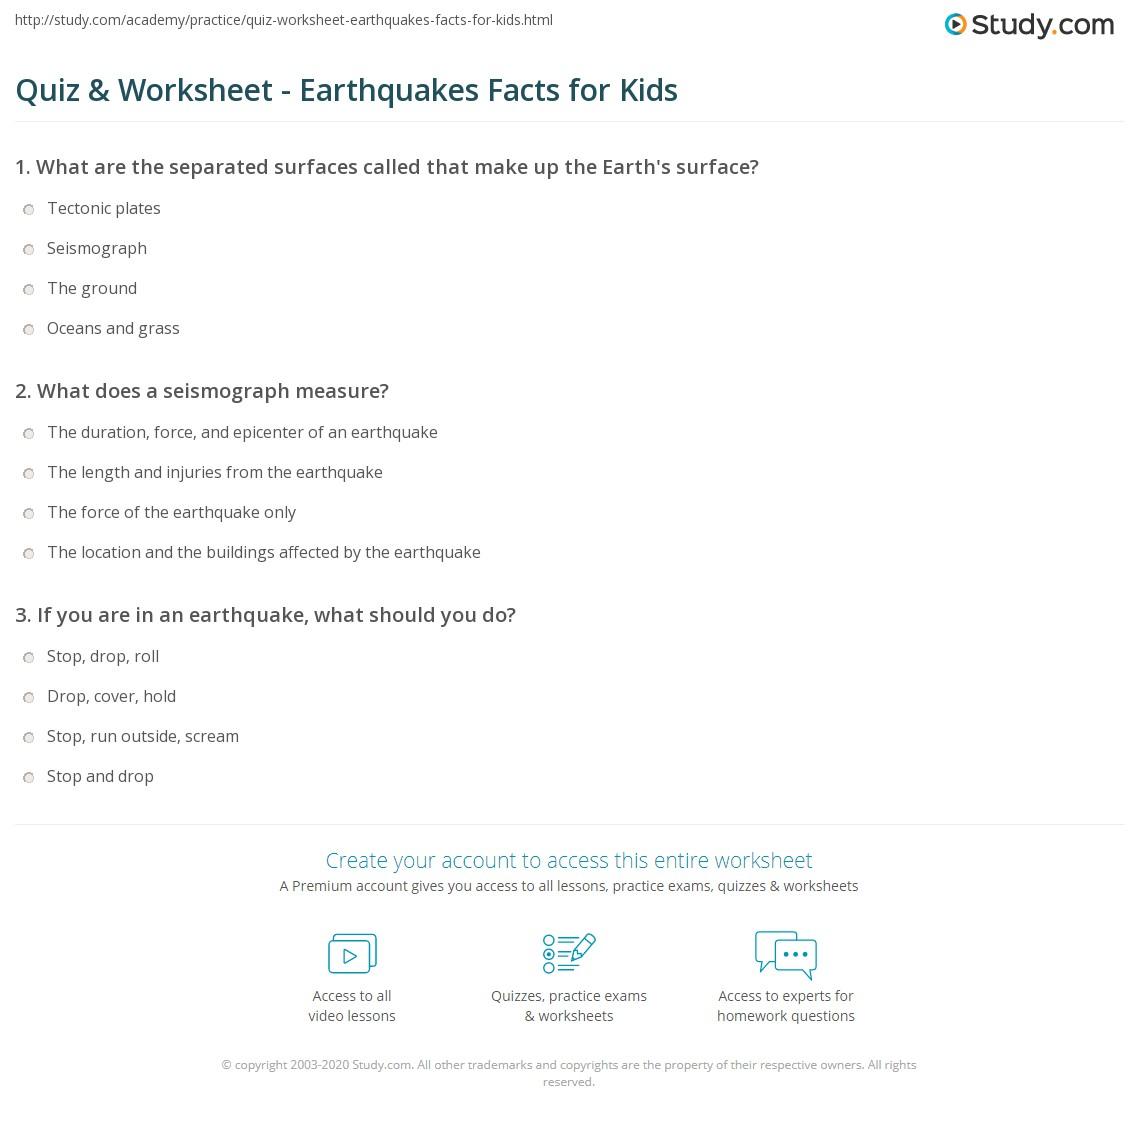 Worksheets Earthquakes For Kids Worksheets quiz worksheet earthquakes facts for kids study com print lesson worksheet